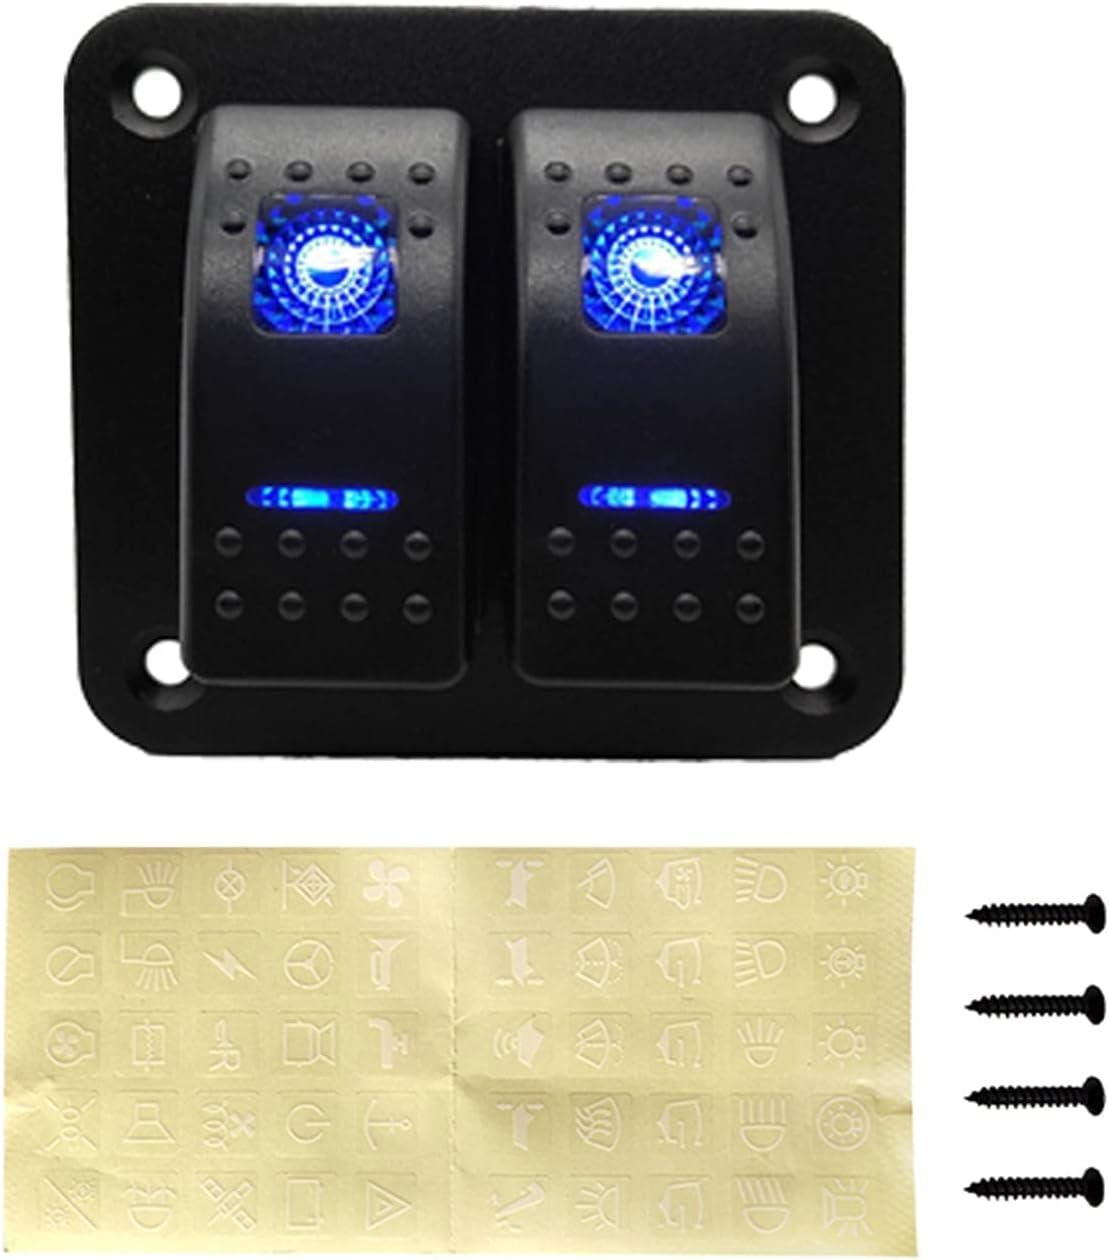 Home Improvement Hardware 2 Gang Switch Max 42% lowest price OFF 12-24V Rocker Panel LED